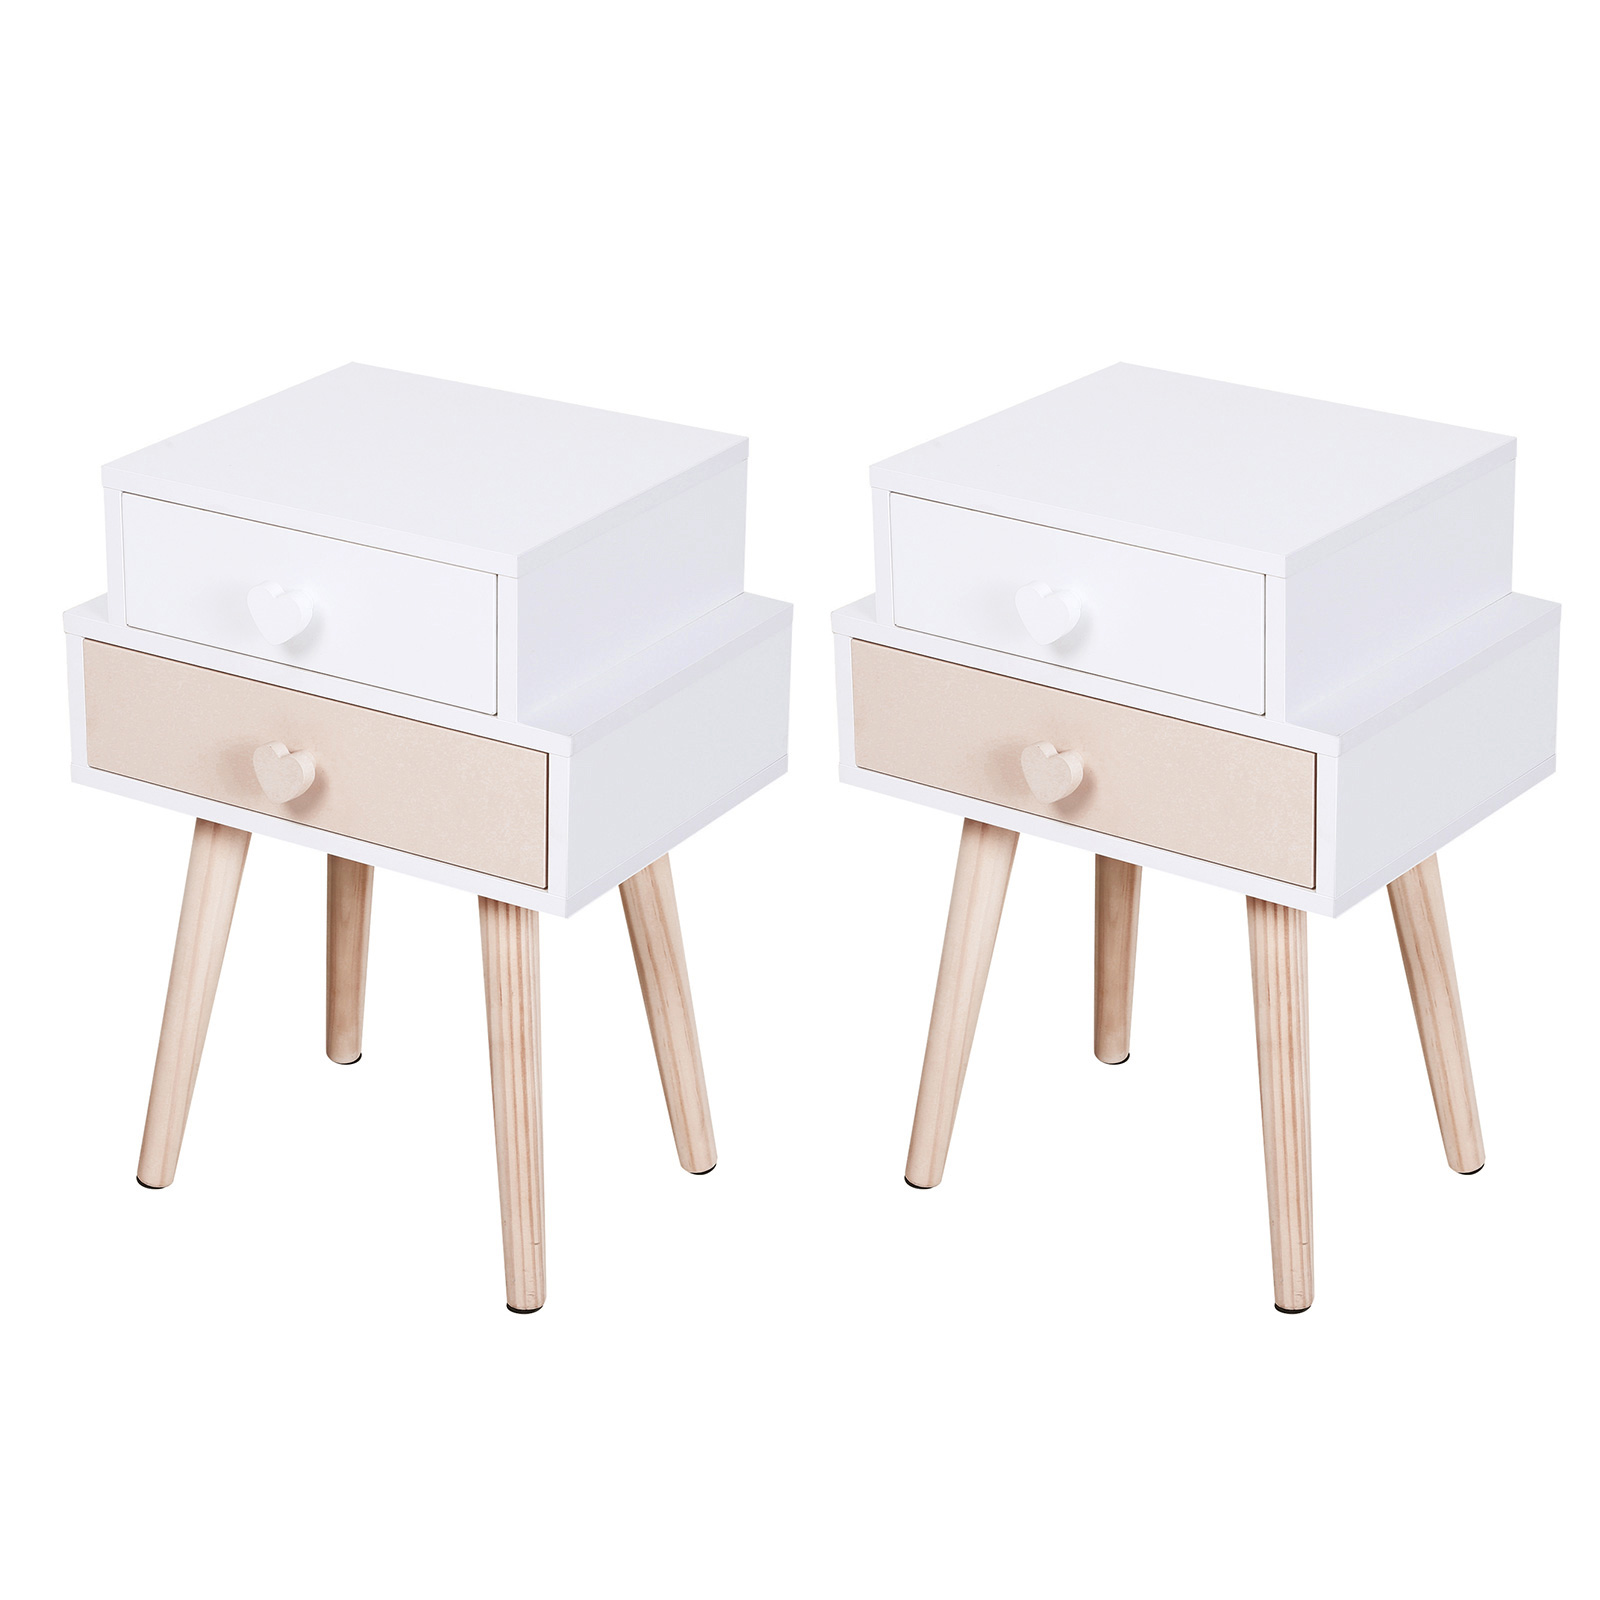 Kids Furniture,Home Goods